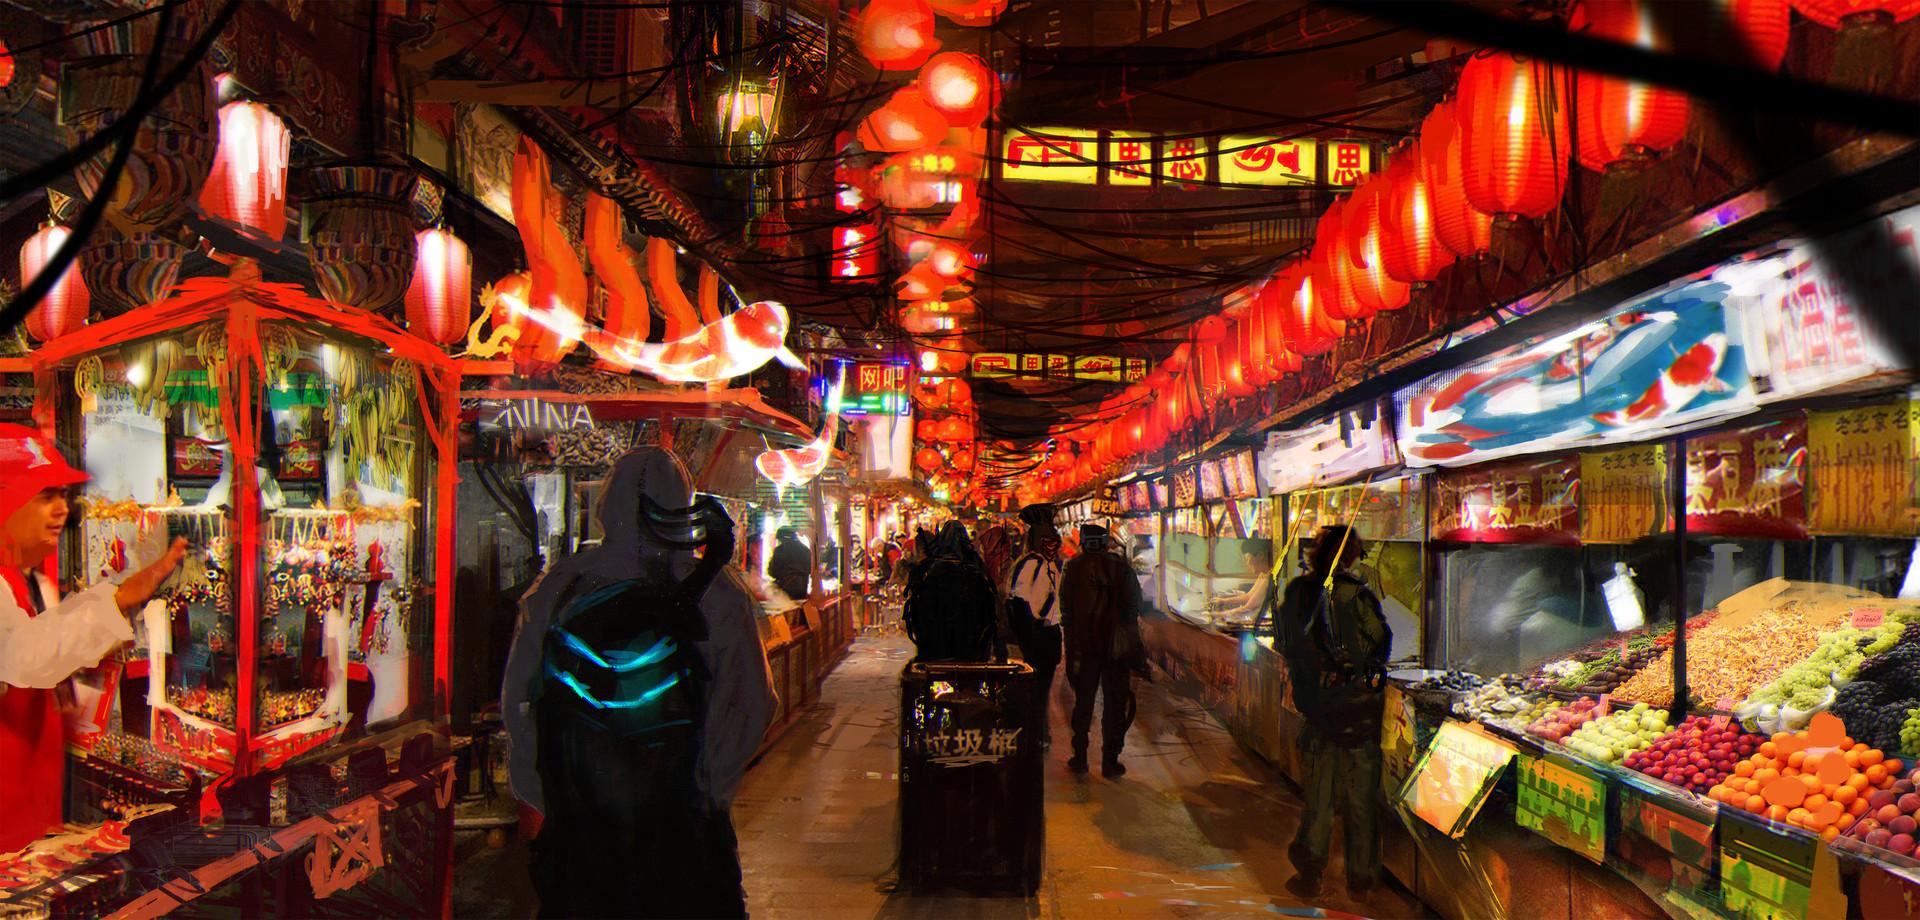 Rutger van de steeg cyberpunk market 10mb